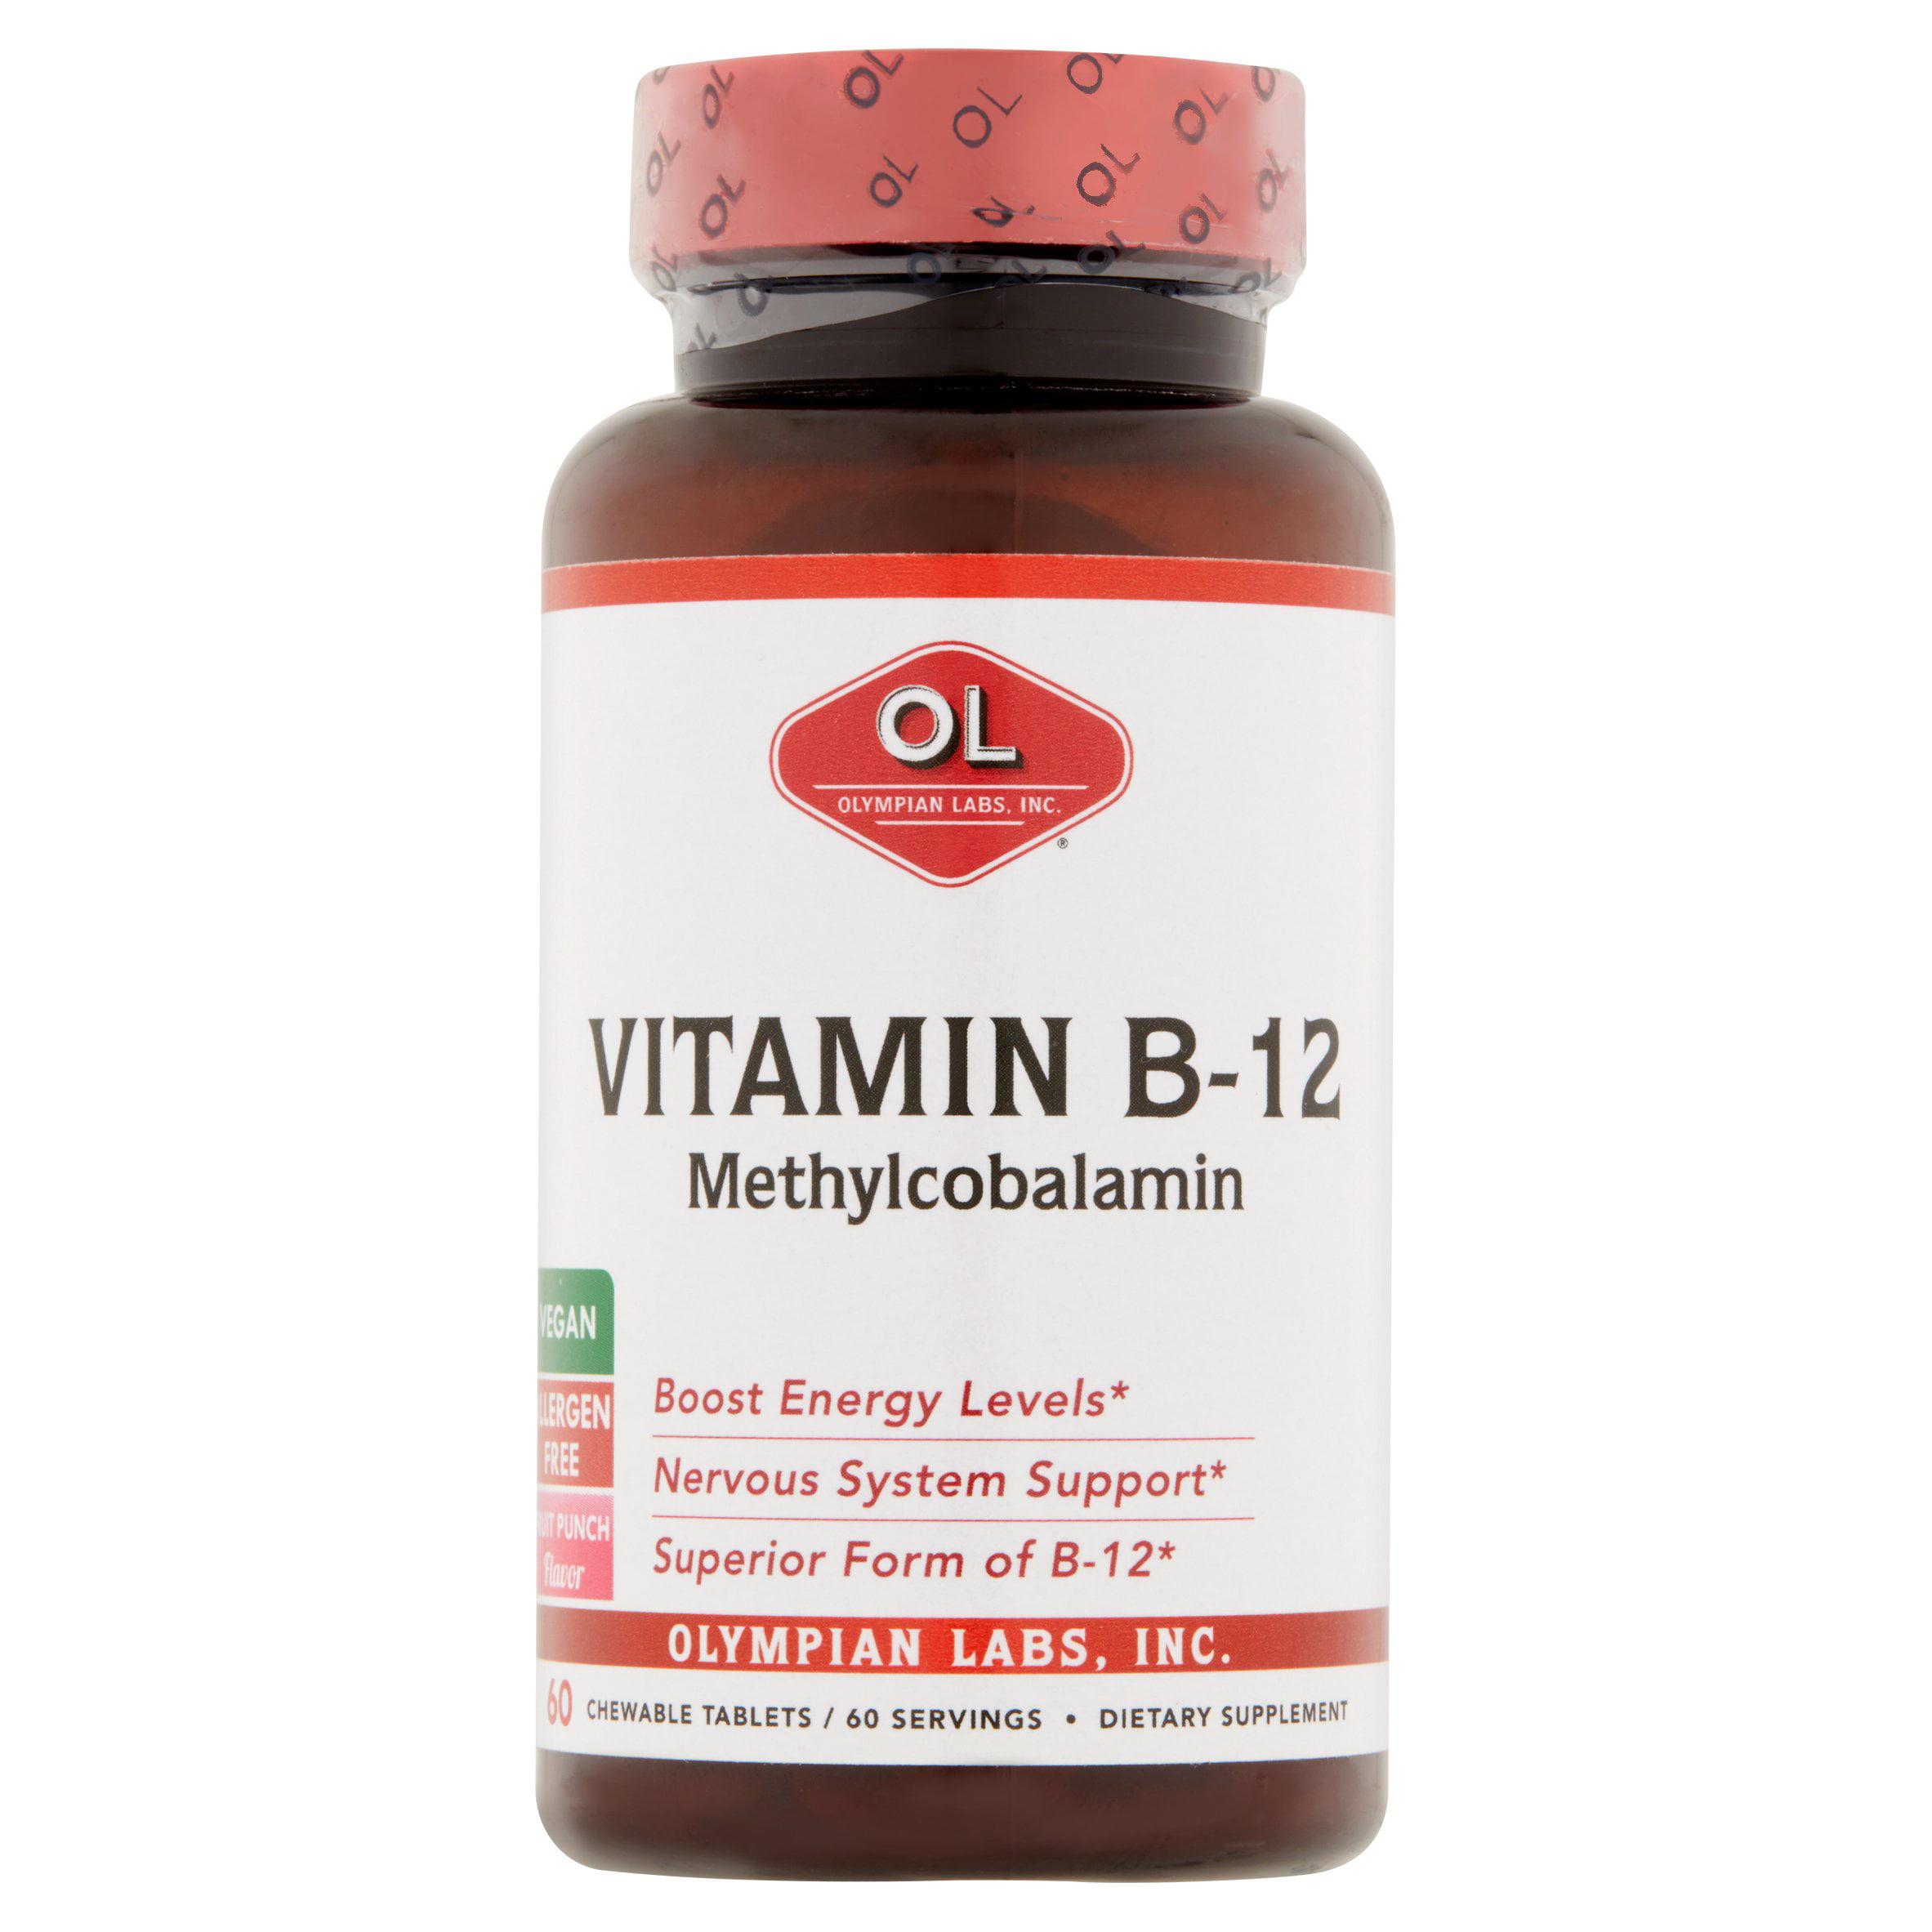 Olympian Labs Vitamin B-12 Methylcobalamin Chewable Tablets, 60 count